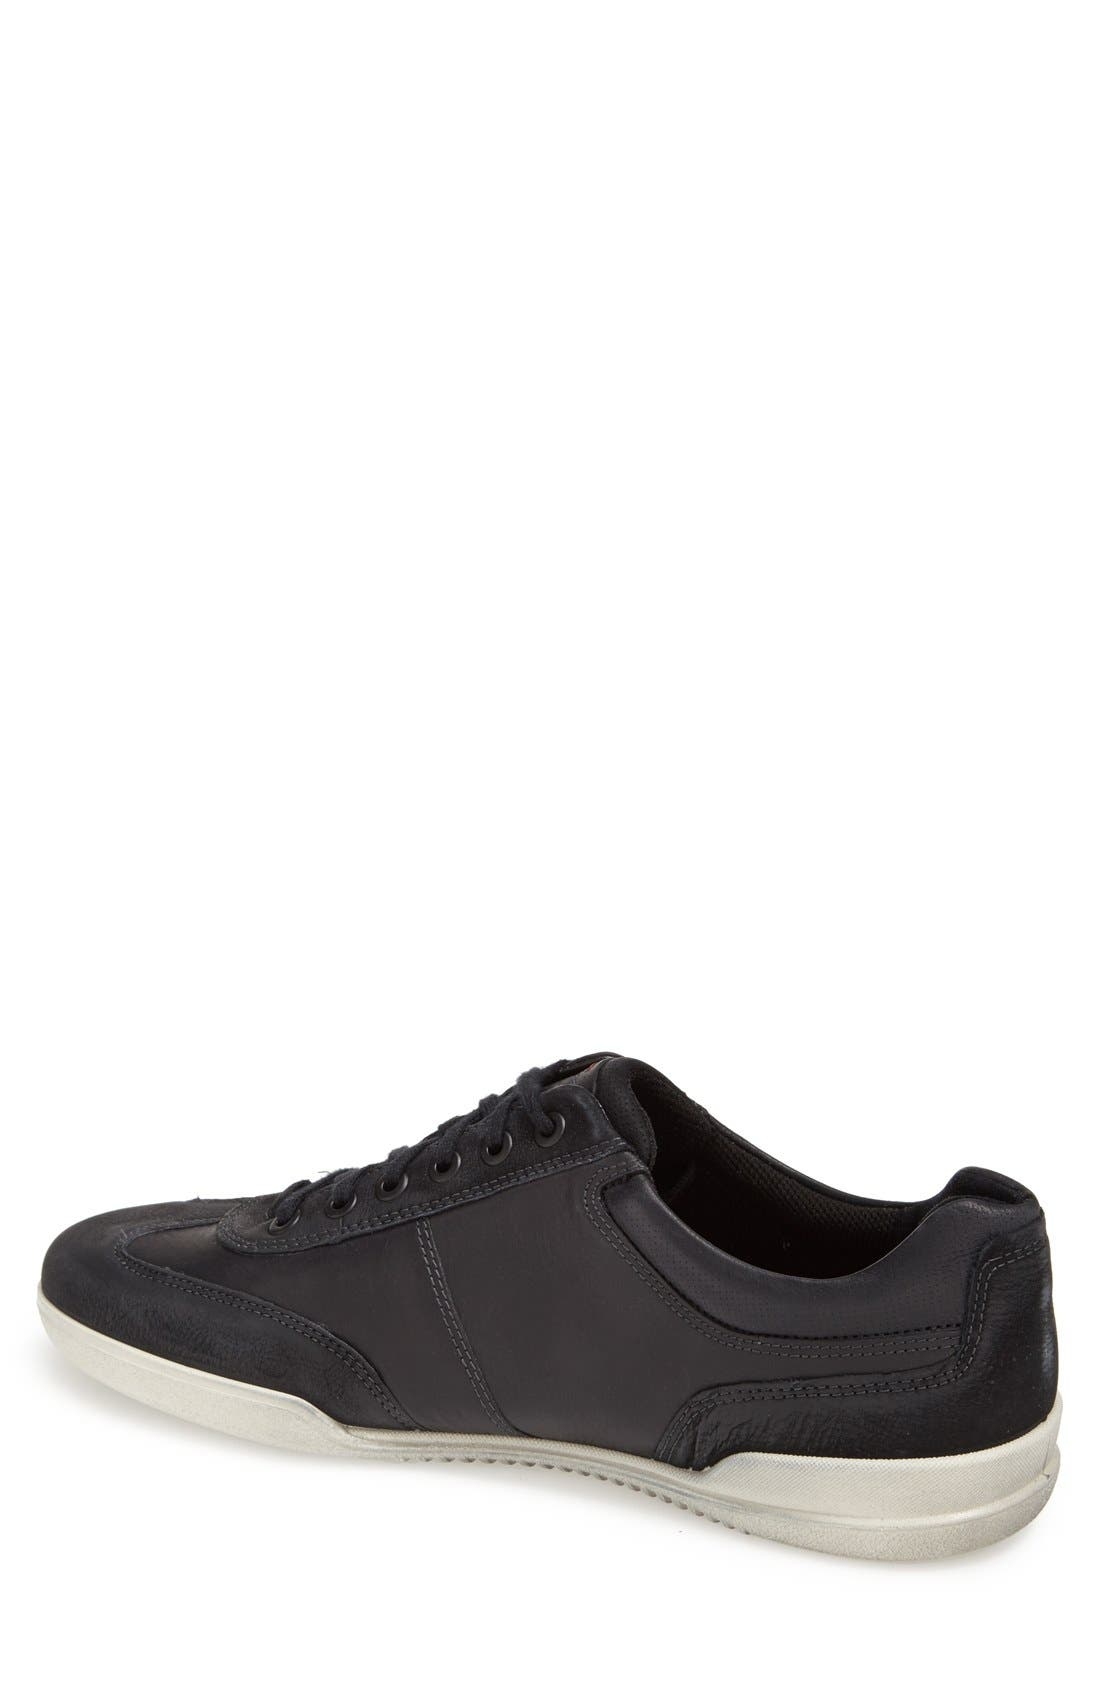 'Enrico' Sneaker,                             Alternate thumbnail 2, color,                             001